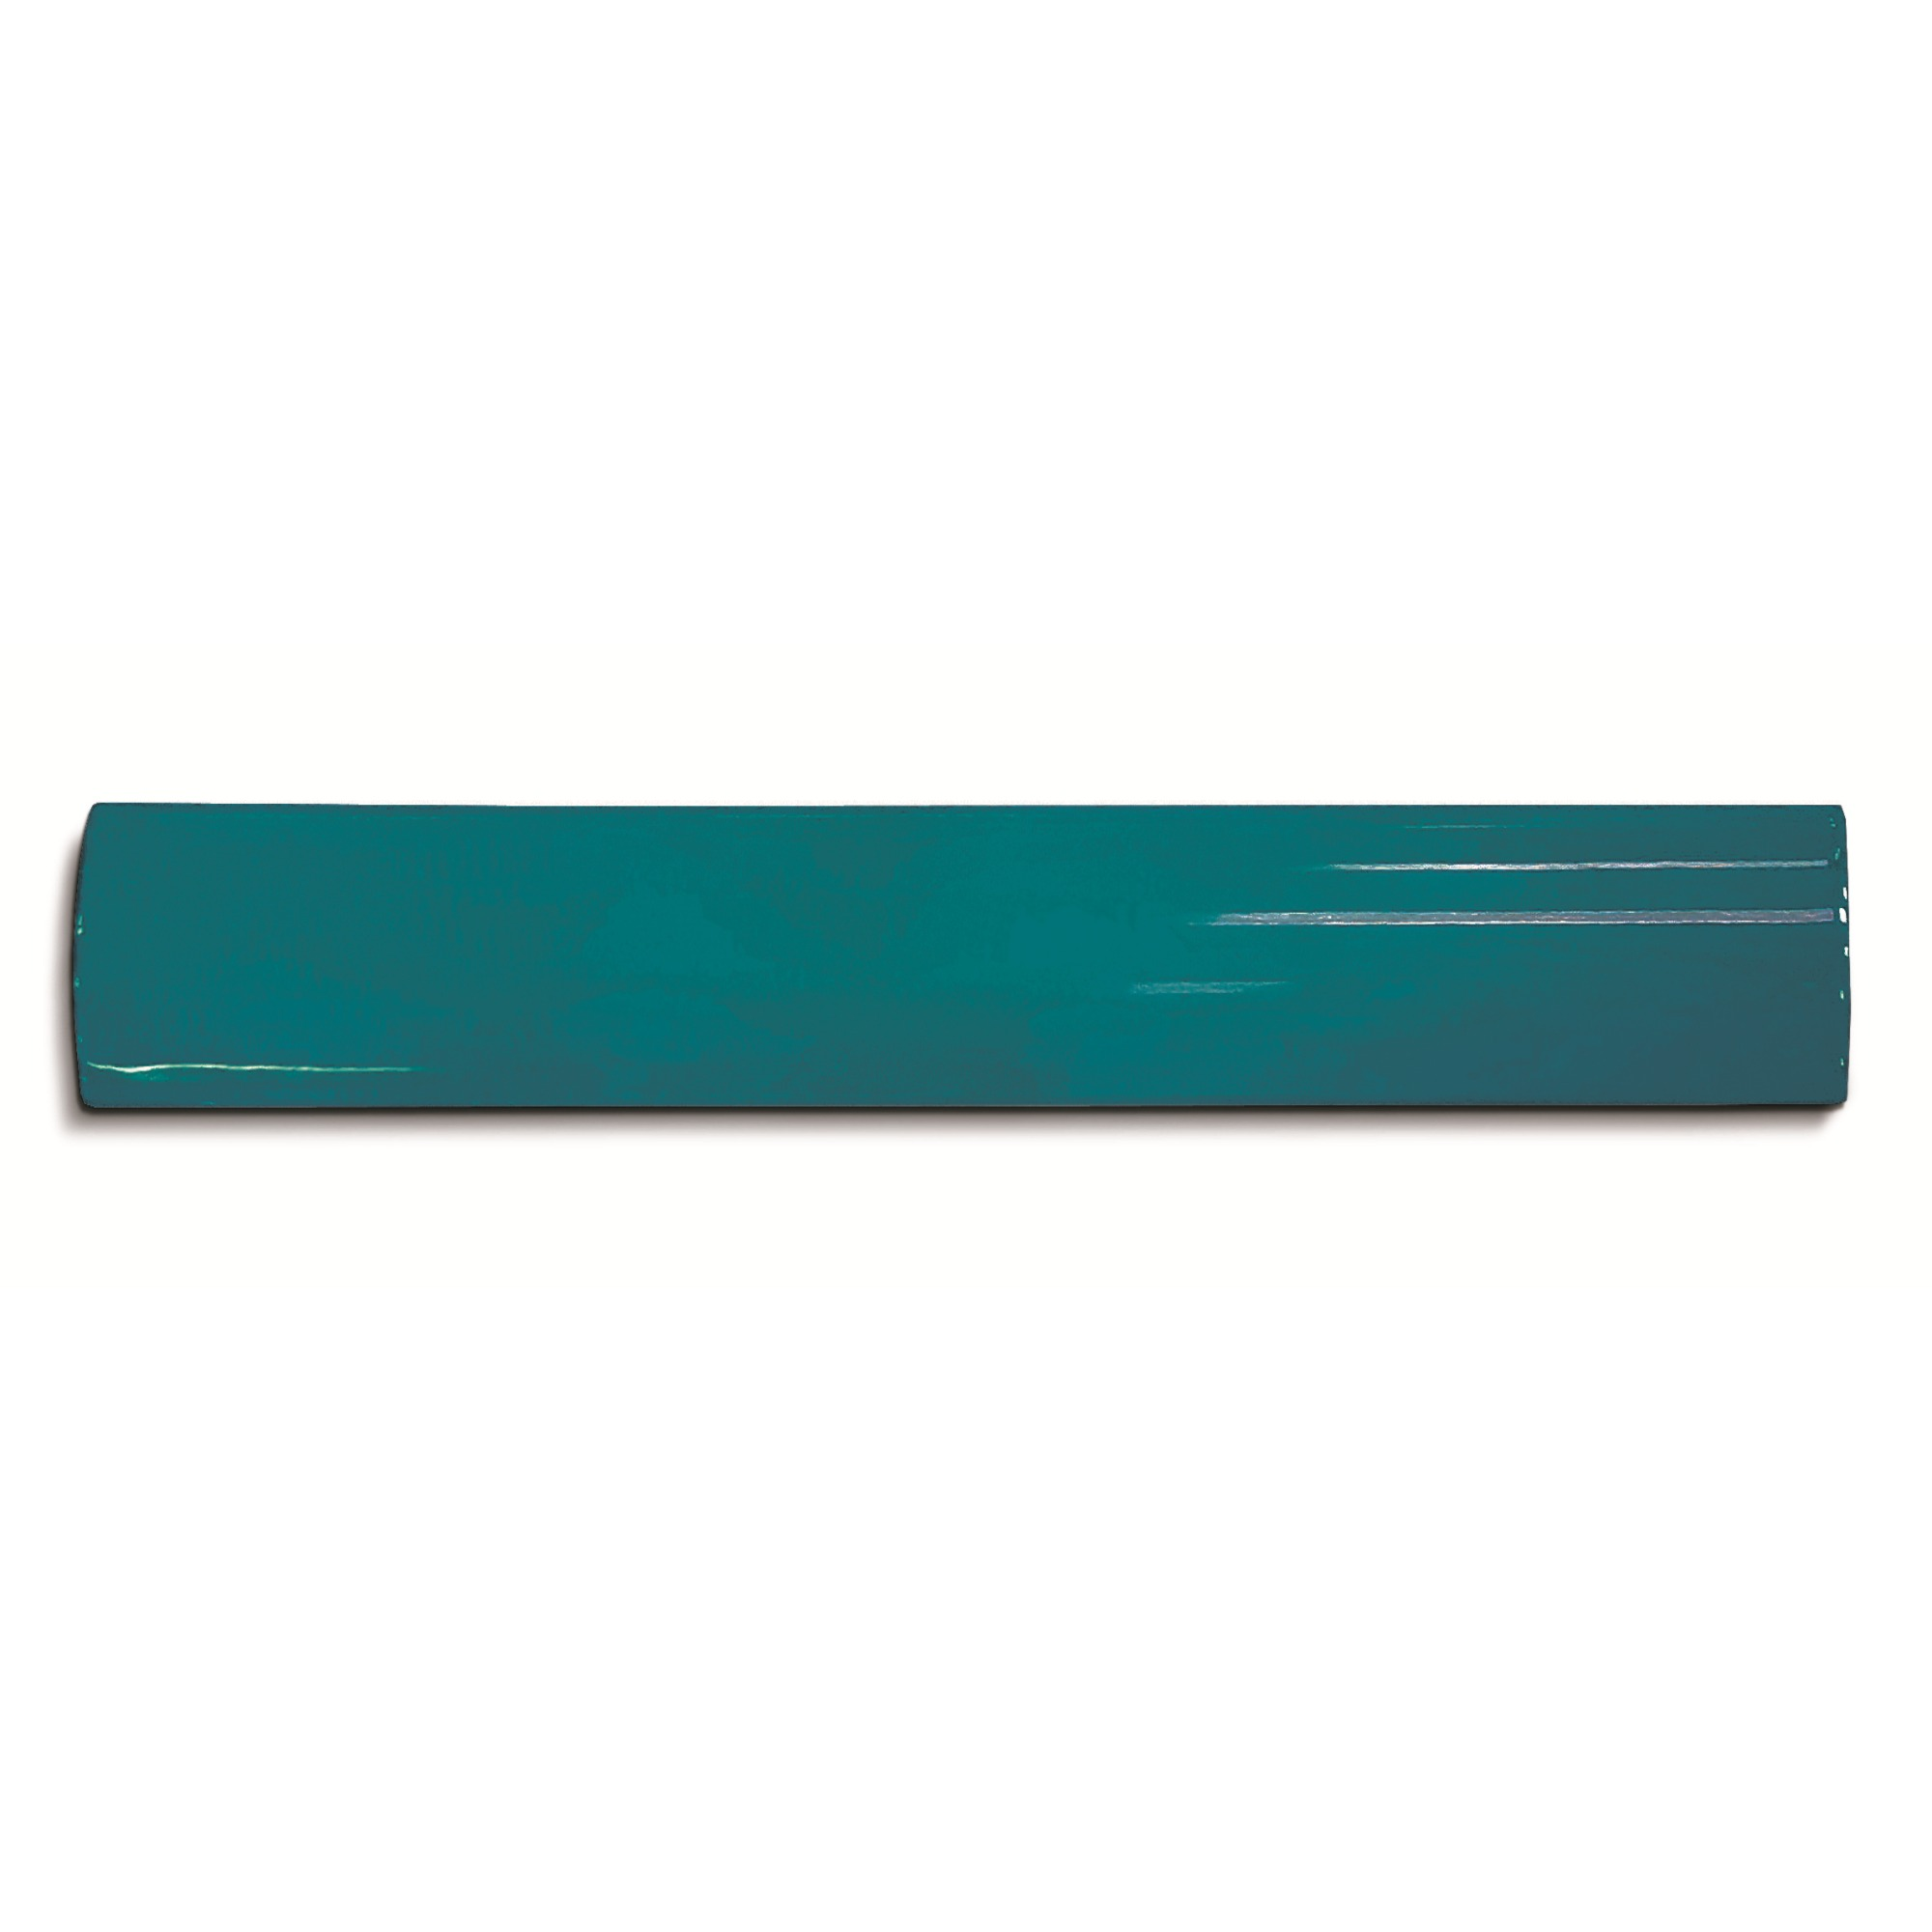 Canaleta Ceramica 25x20 cm Azul mar - Eliane